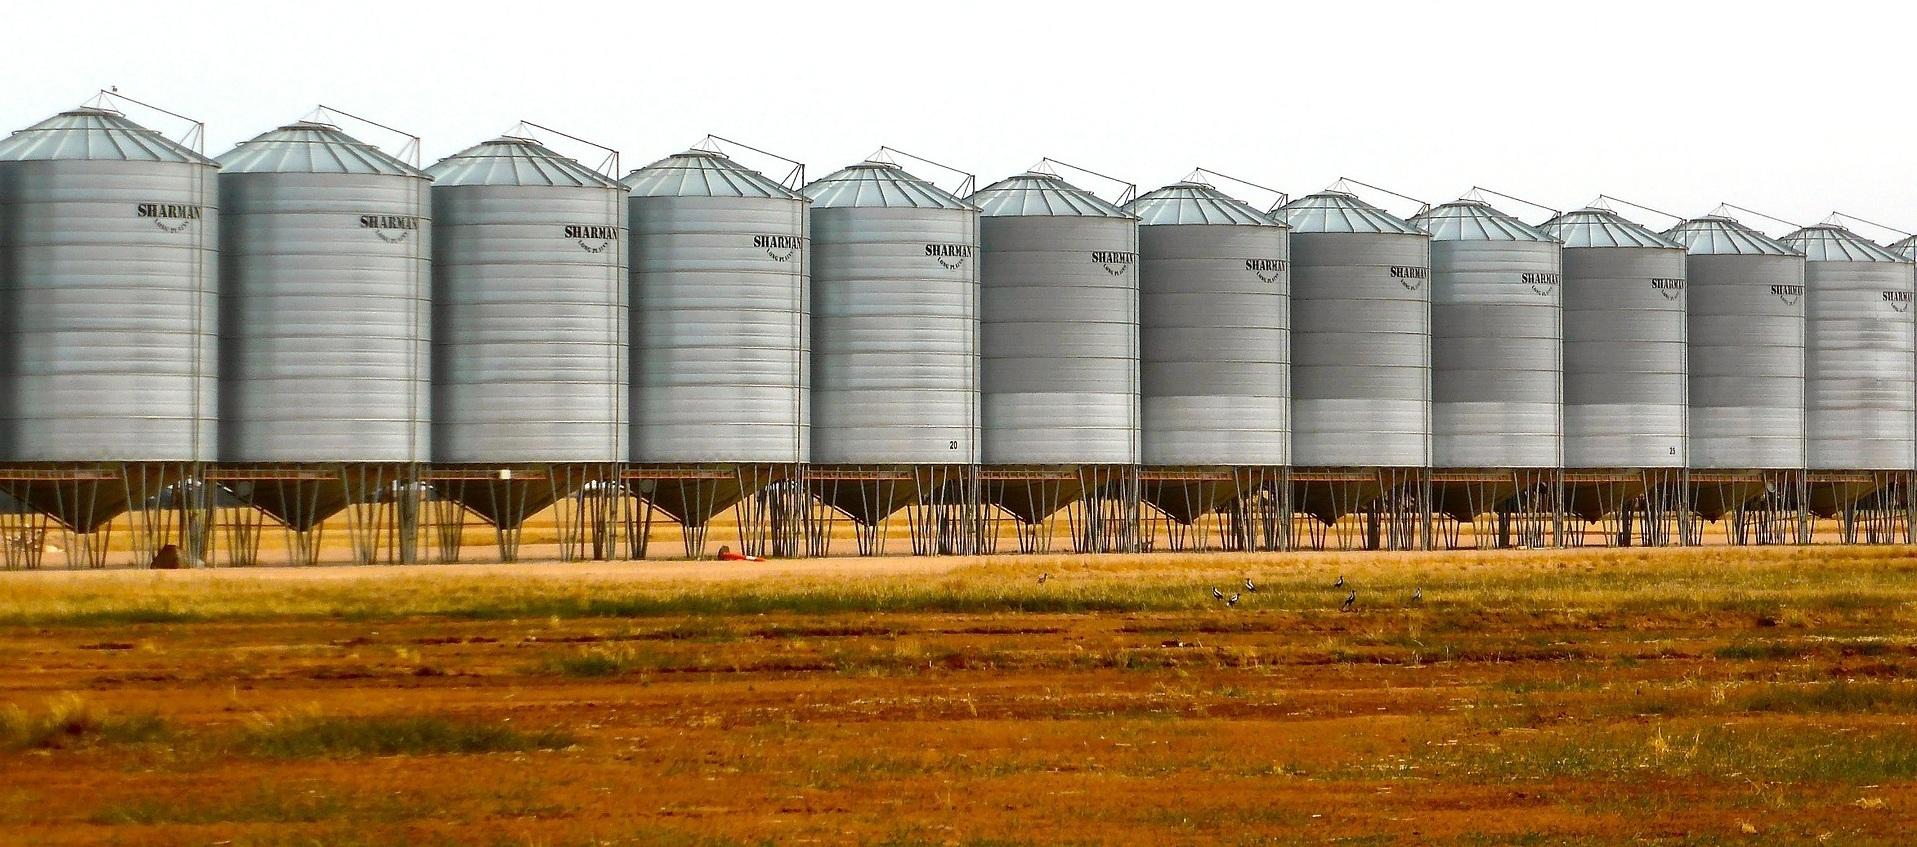 Food security gaining importance as Dubai food stuff trade crosses AED52 billion